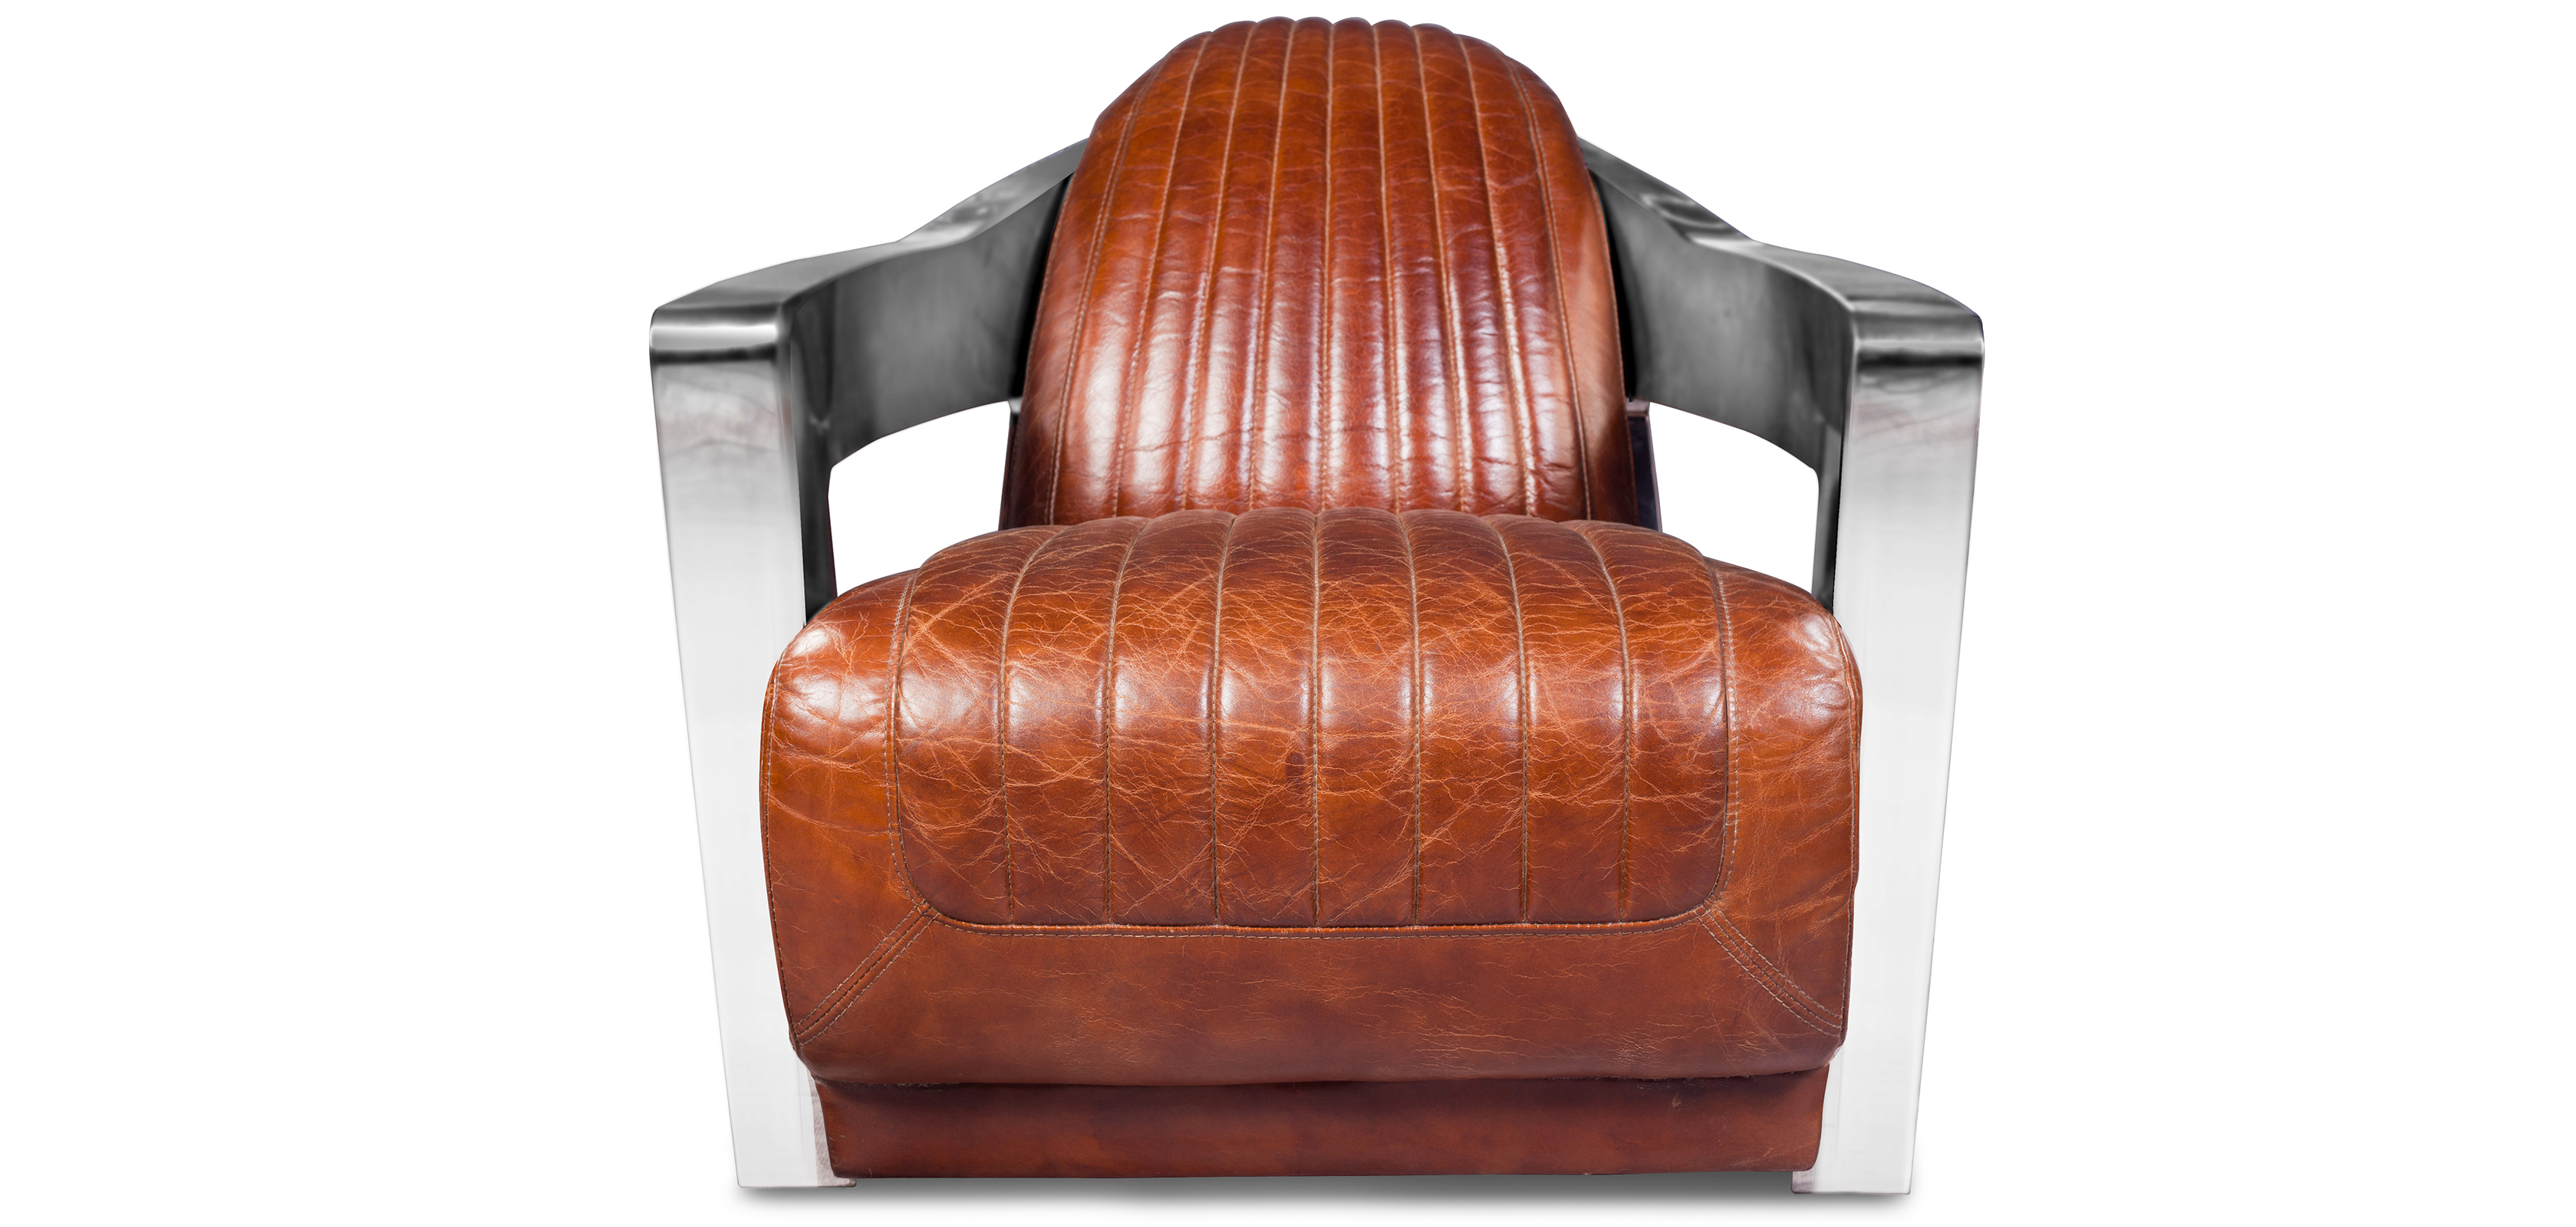 Design Sessel Churchill Lounge Hochwertiges Leder Stahl